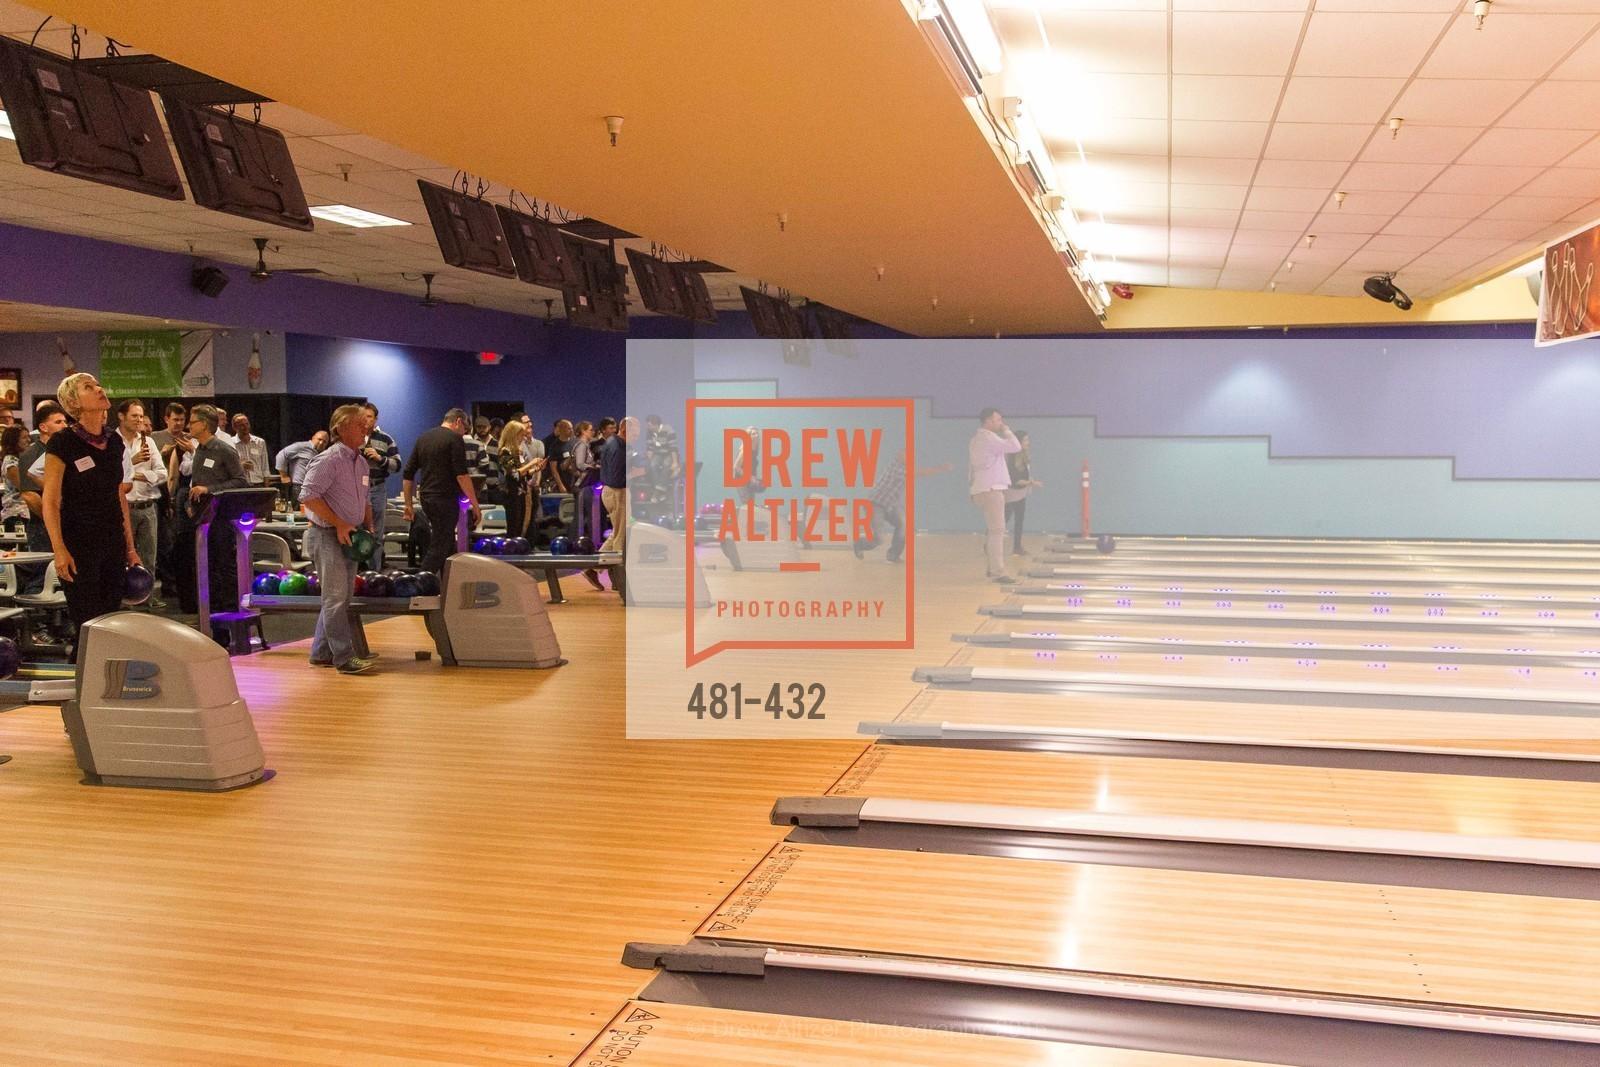 Bowling, ScavulloDesign Centric Builders Bowling Party, Presidio Bowl. 93 Moraga Ave, October 29th, 2015